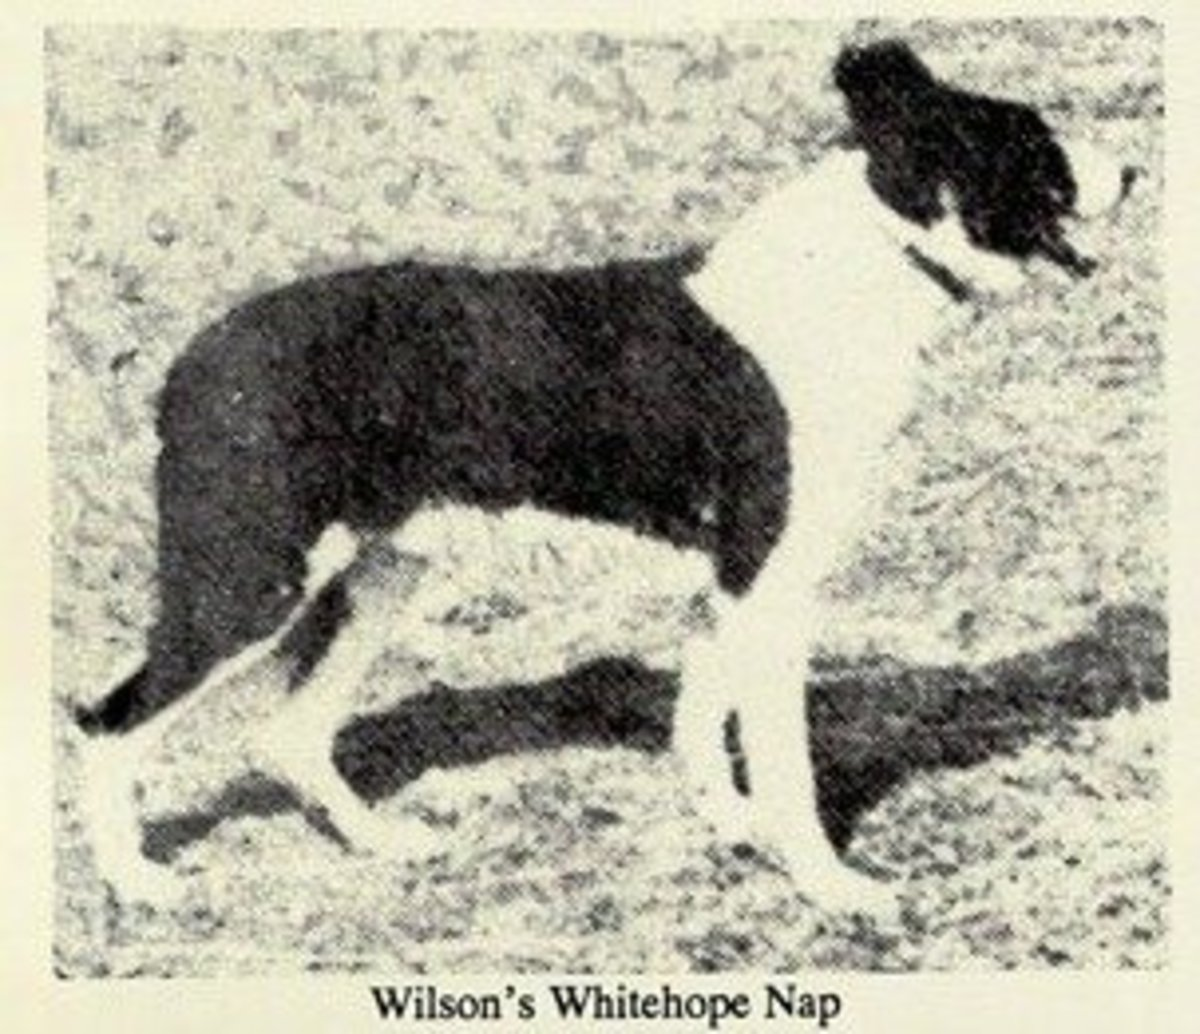 Whitehope Nap